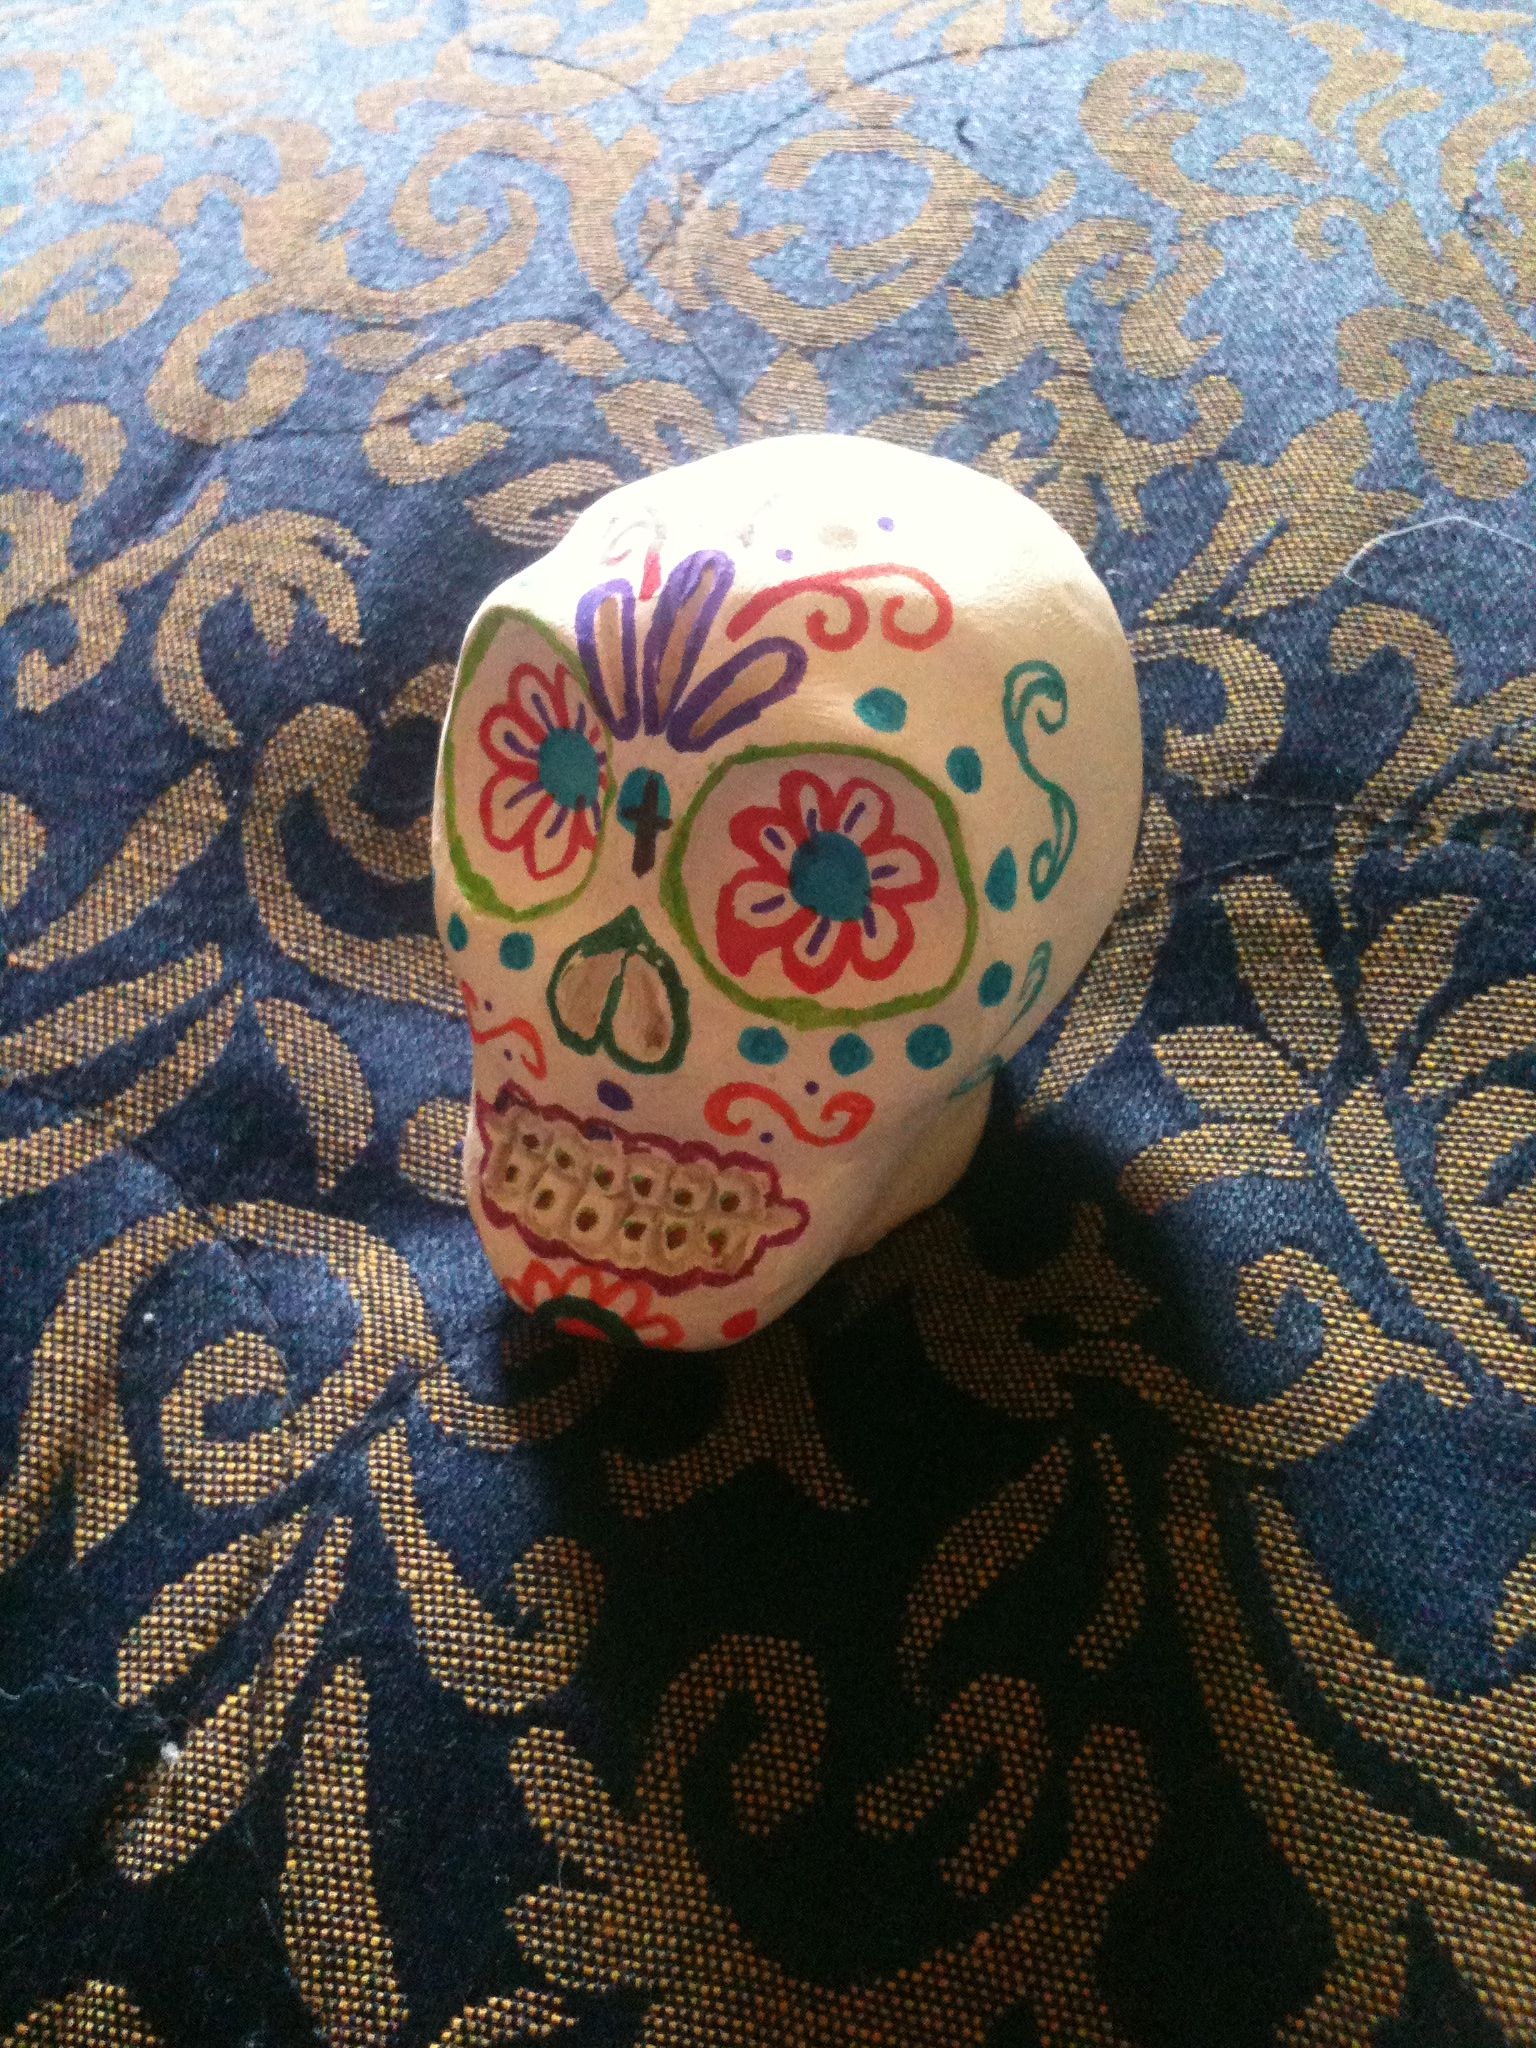 Pin By Monica Bustillos Martinez On Our Creations Crayola Air Dry Clay Air Dry Clay Sugar Skull Diy